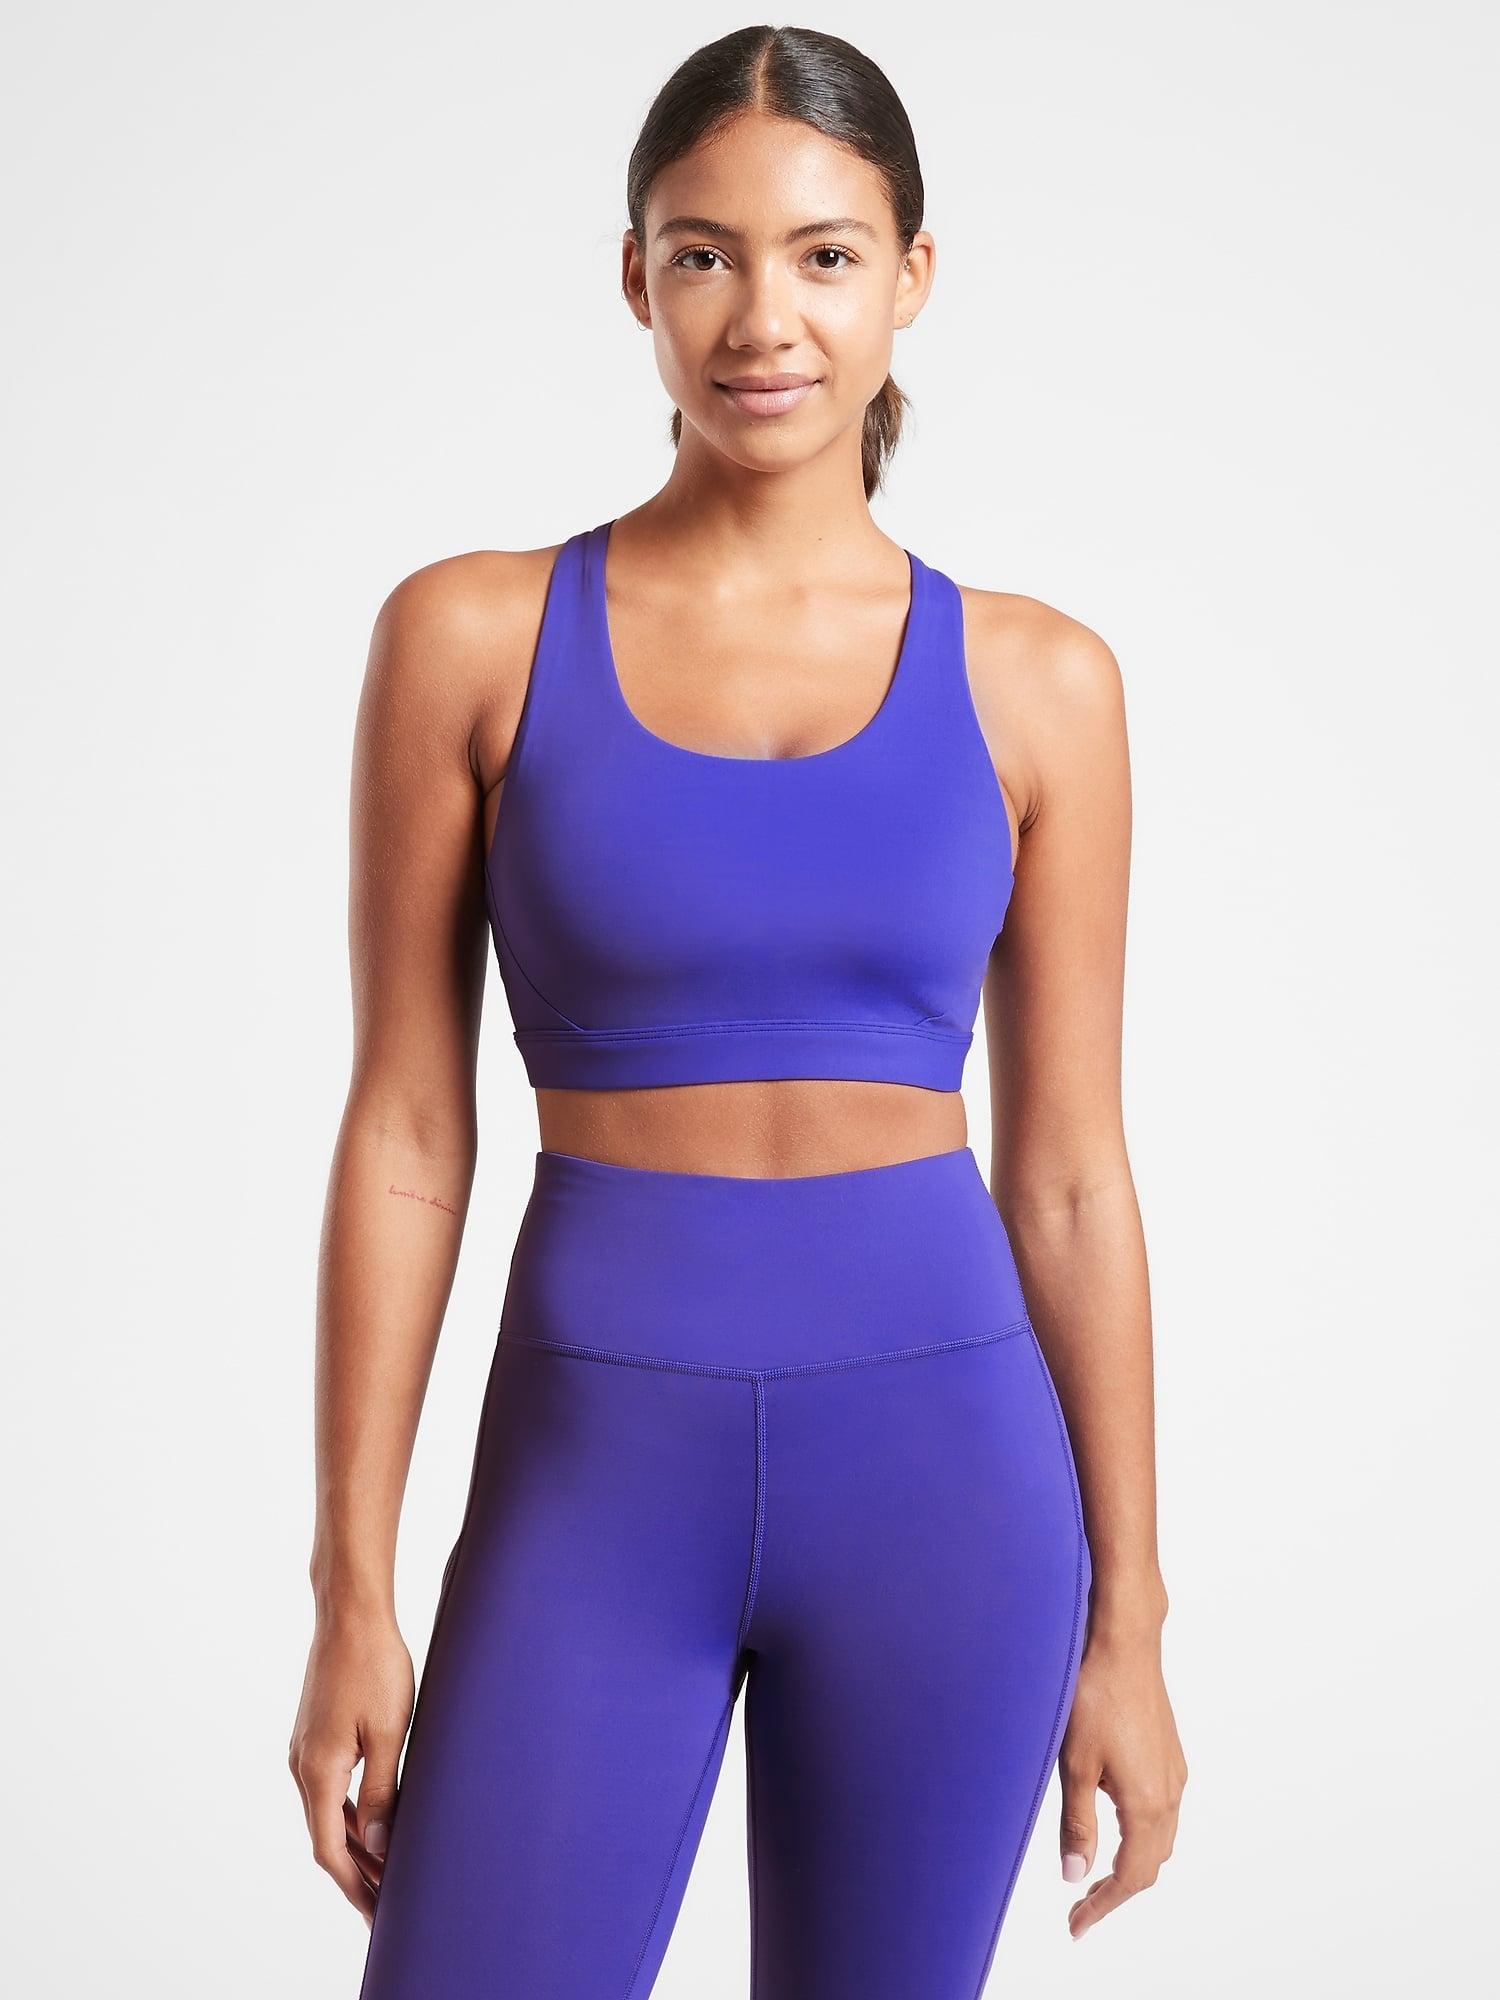 Strength Training Crossback Strappy Bra Medium Support Activewear for Yoga Pilate Akalnny Sport Bra for Women